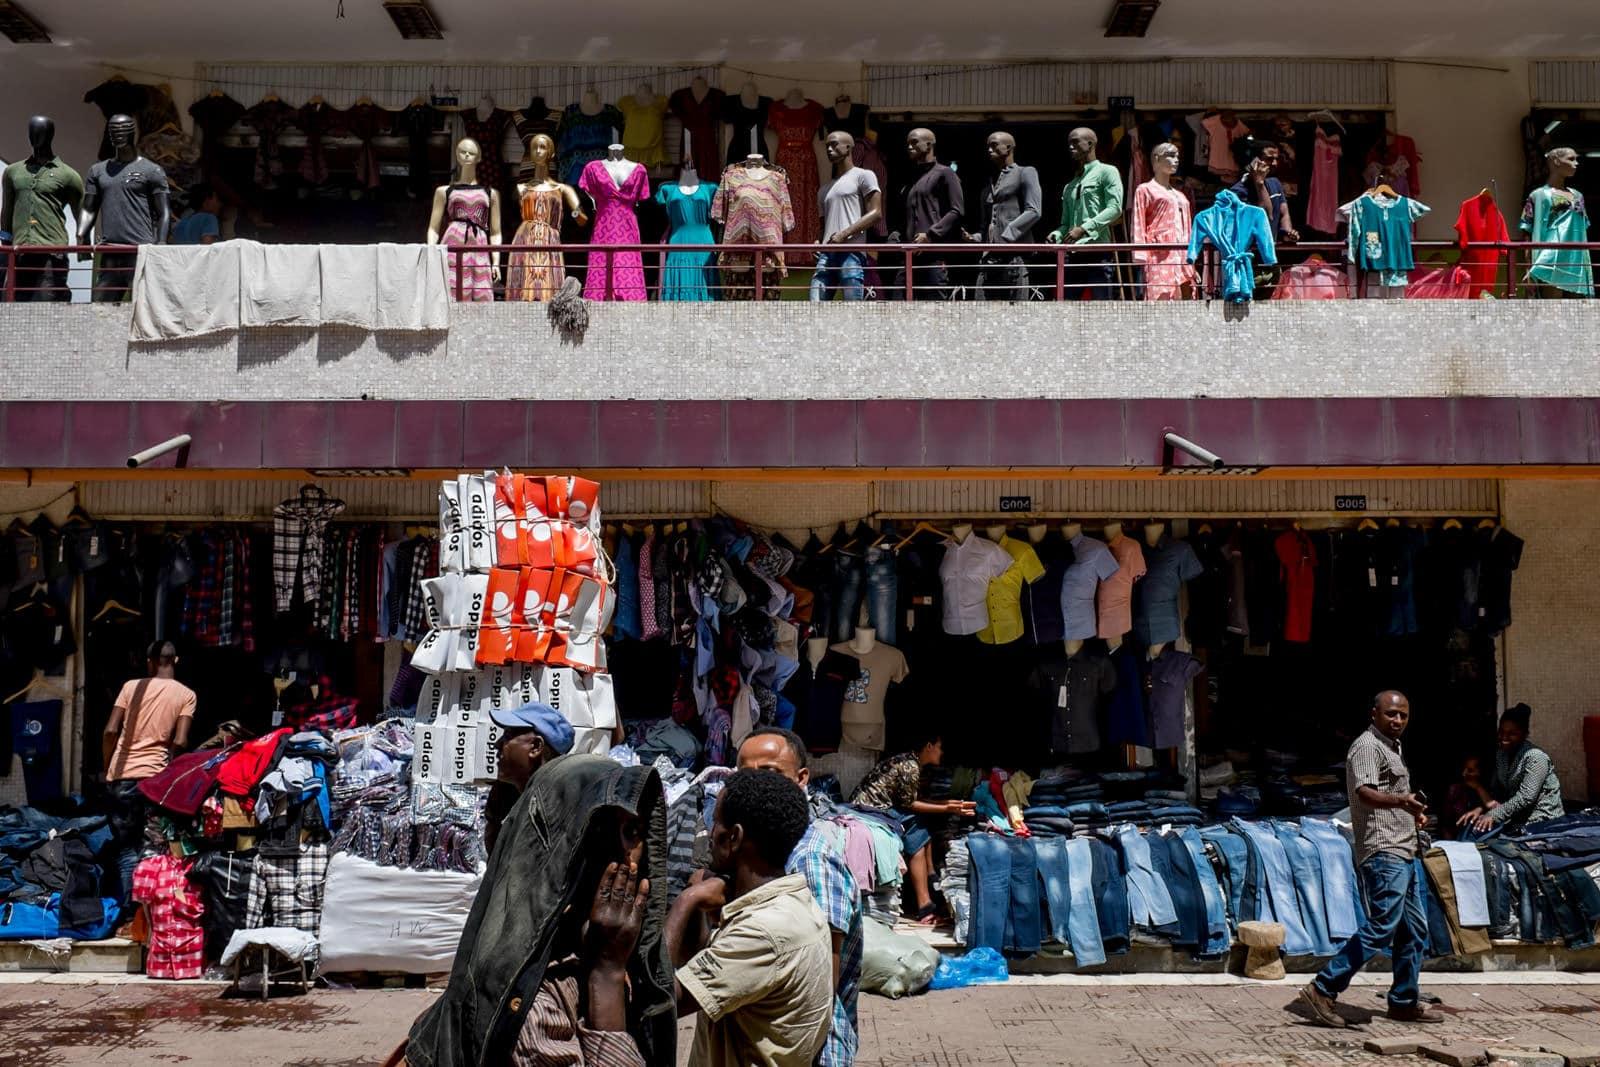 Addis Merkato market in the capital of Ethiopia Addis Ababa